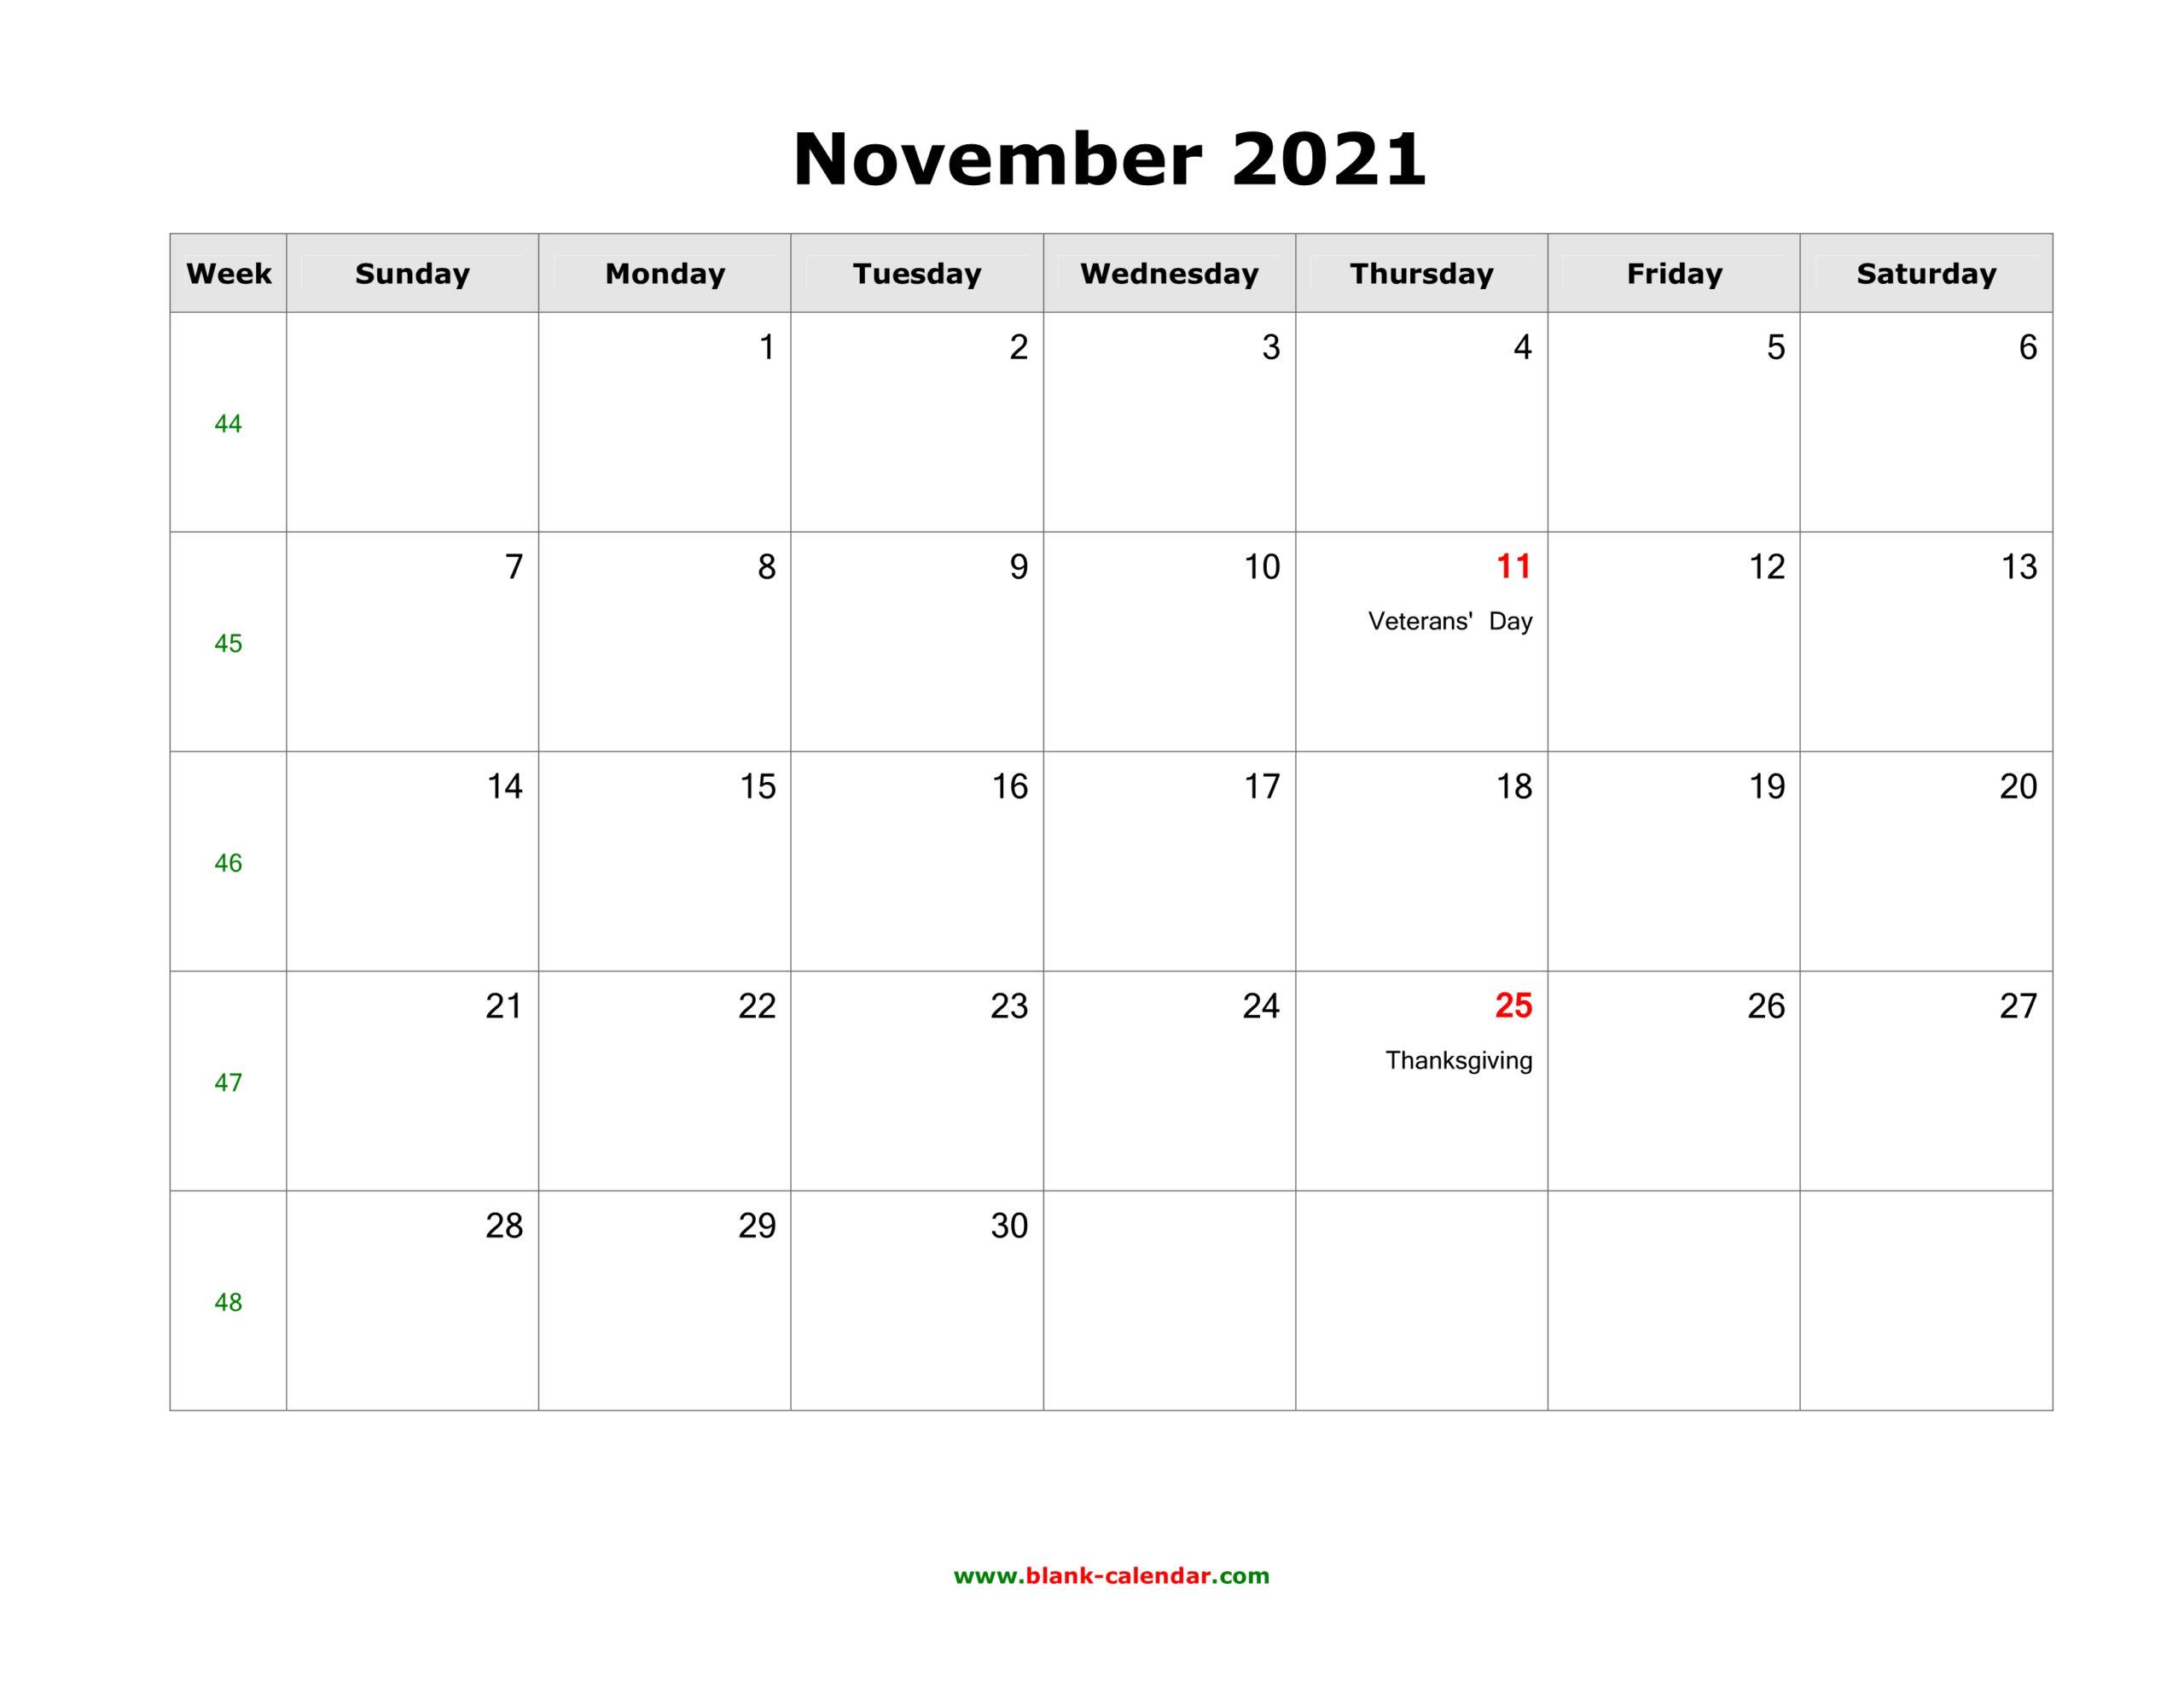 November 2021 Blank Calendar   Free Download Calendar